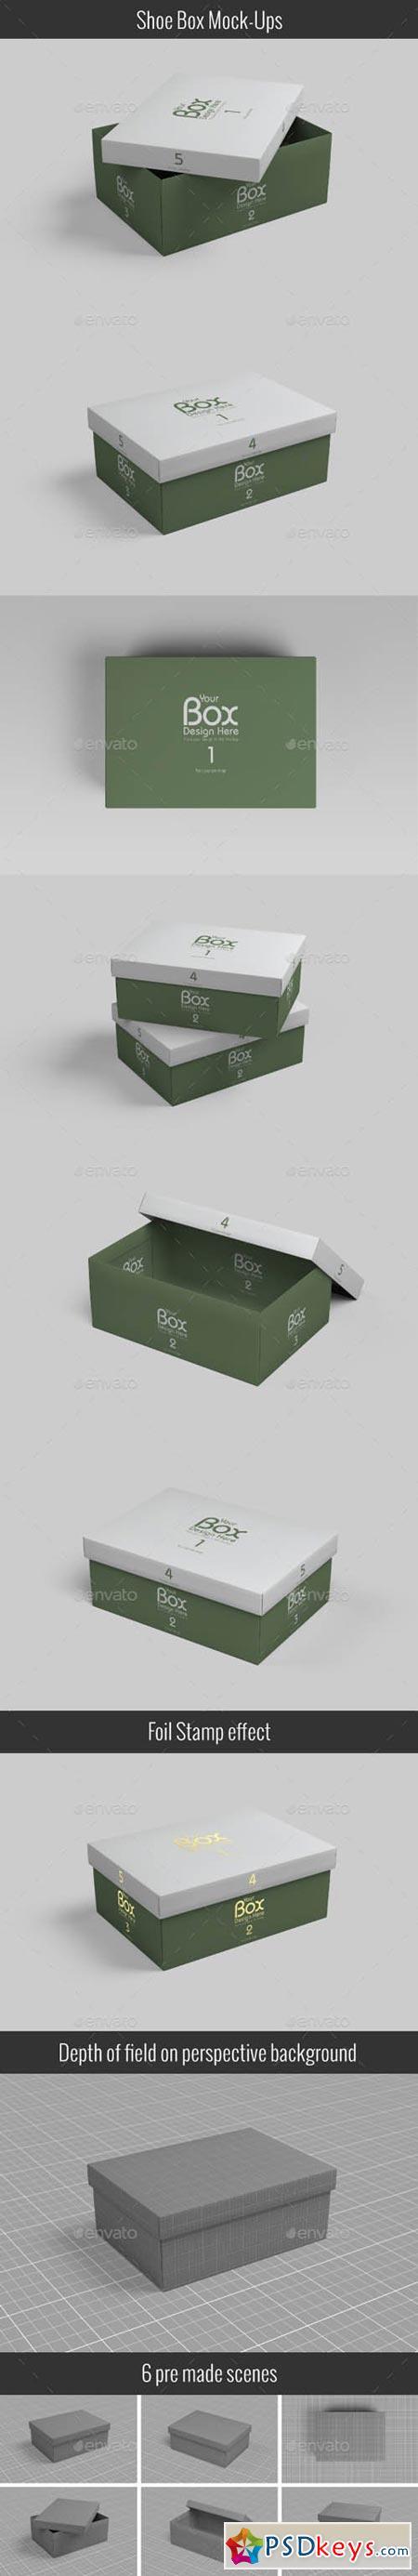 Shoe Box Mockups 21020438